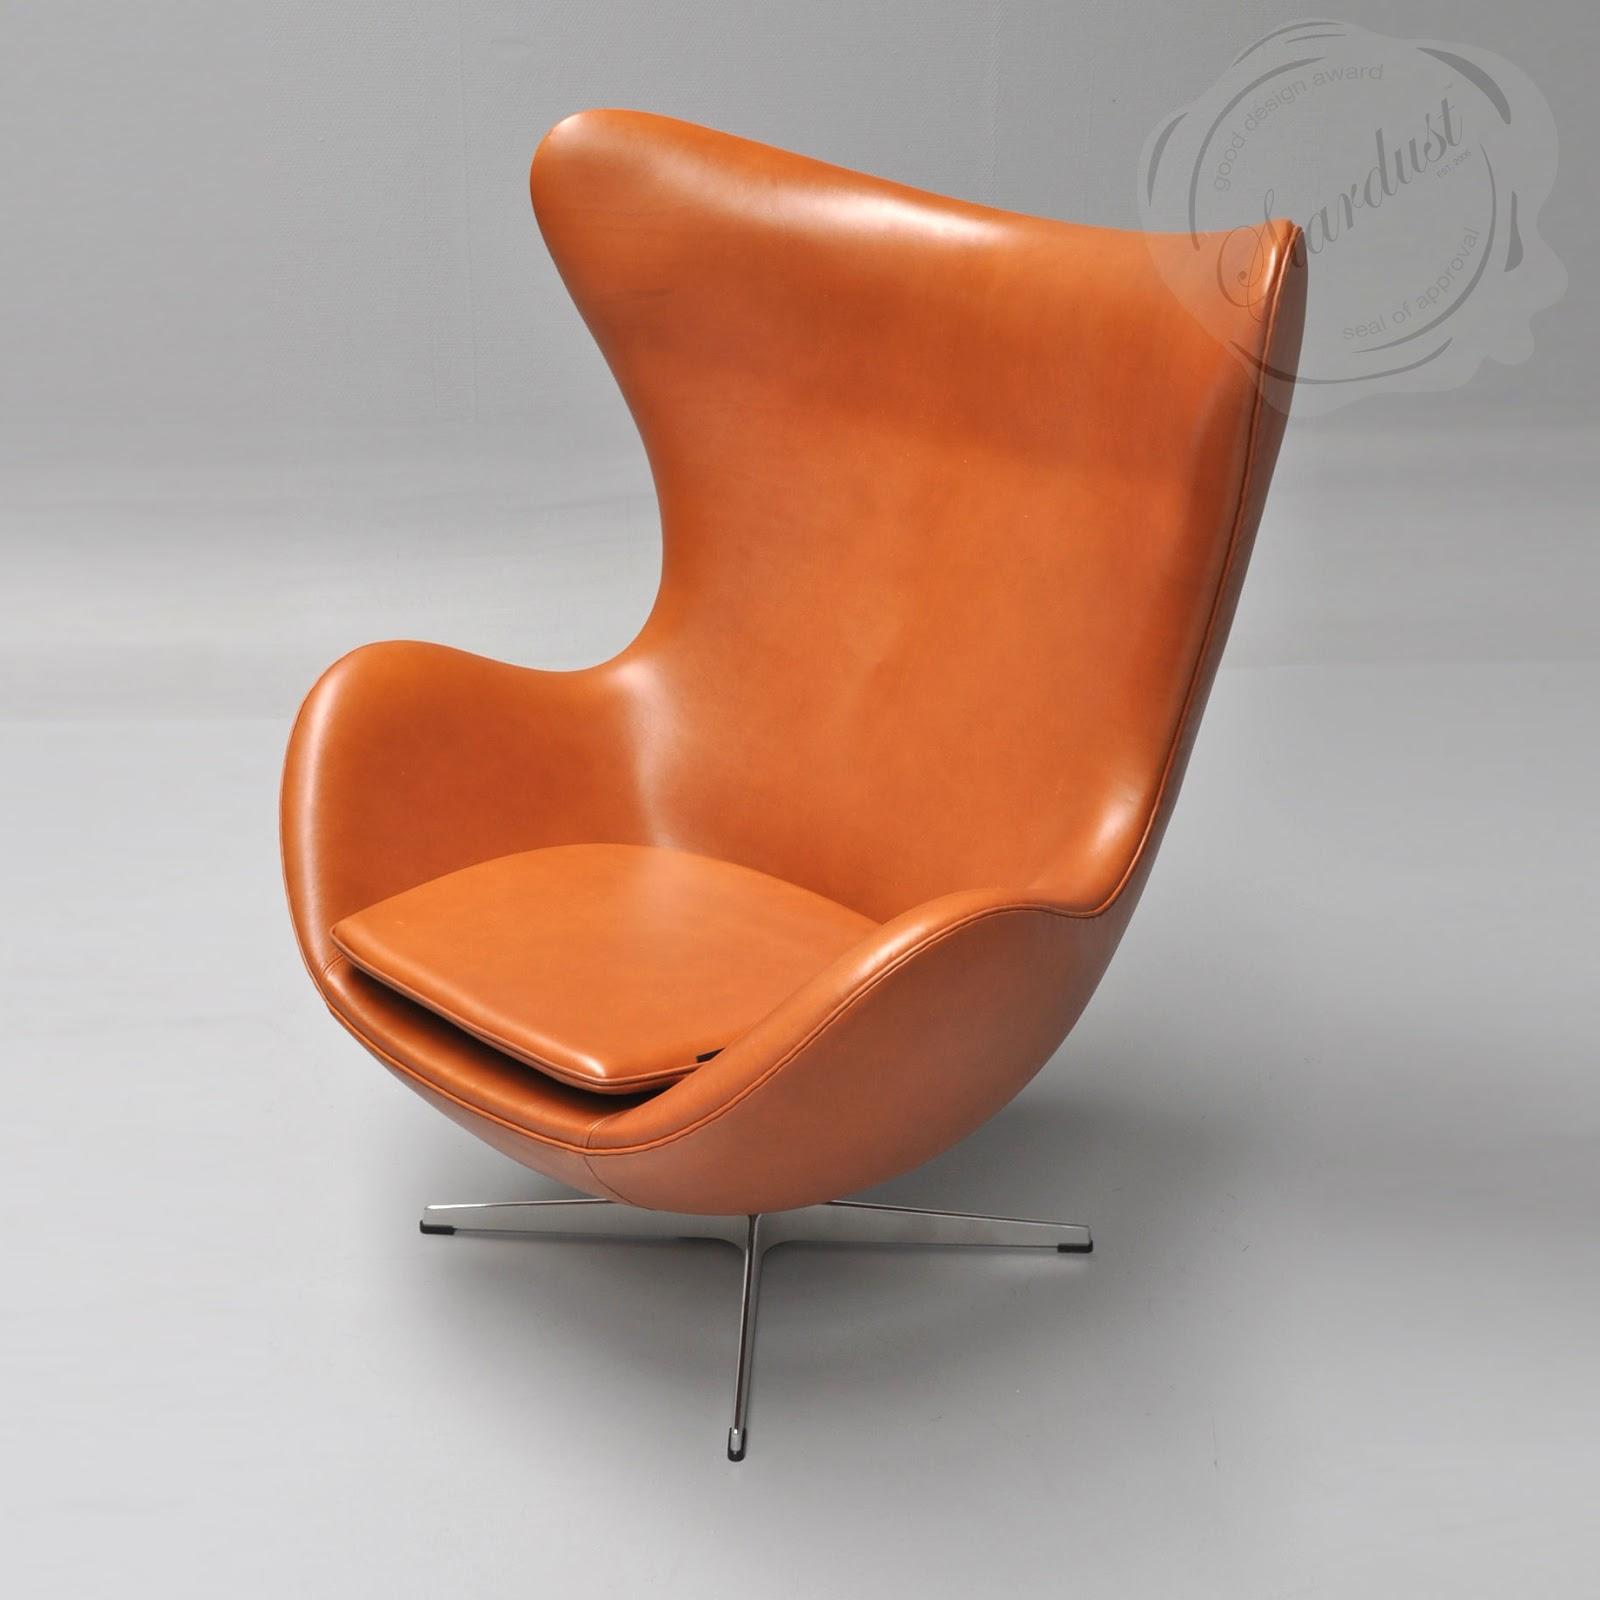 best egg chair reproduction 100 arne jacobsen egg chair replica wholesale replica arne. Black Bedroom Furniture Sets. Home Design Ideas